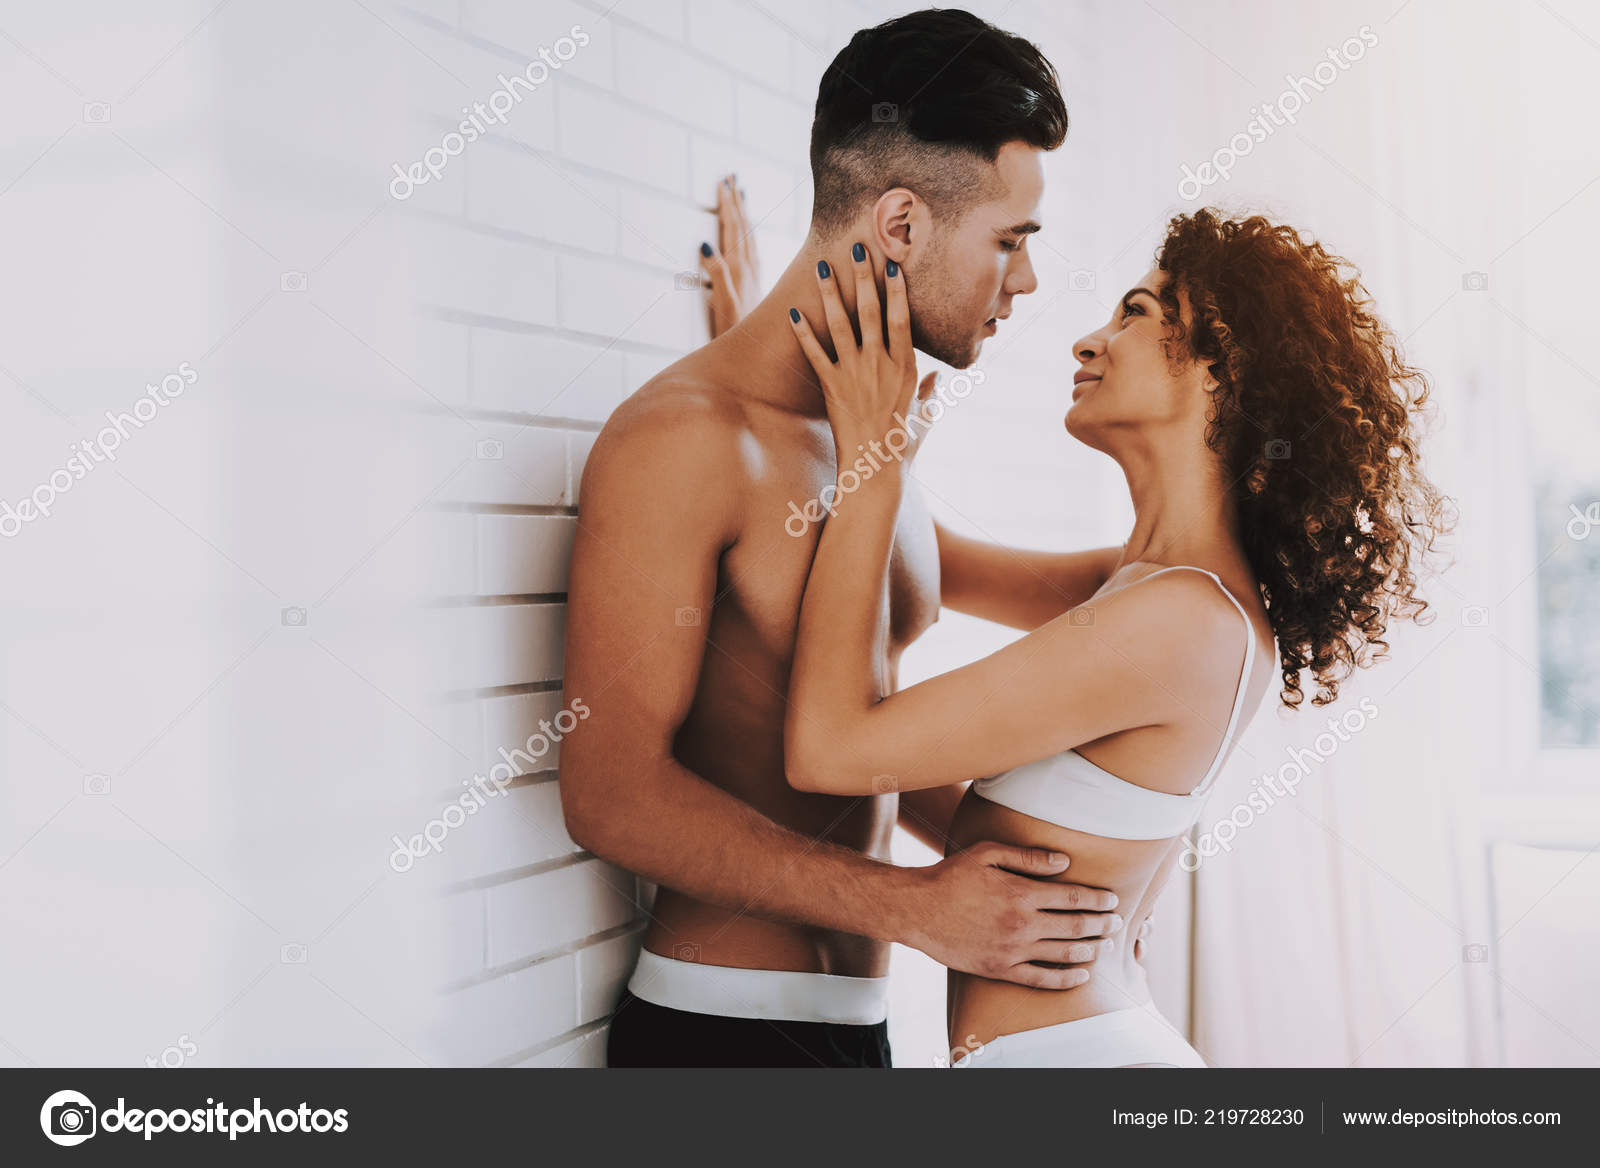 MARIE: Attractive model couple passionate love